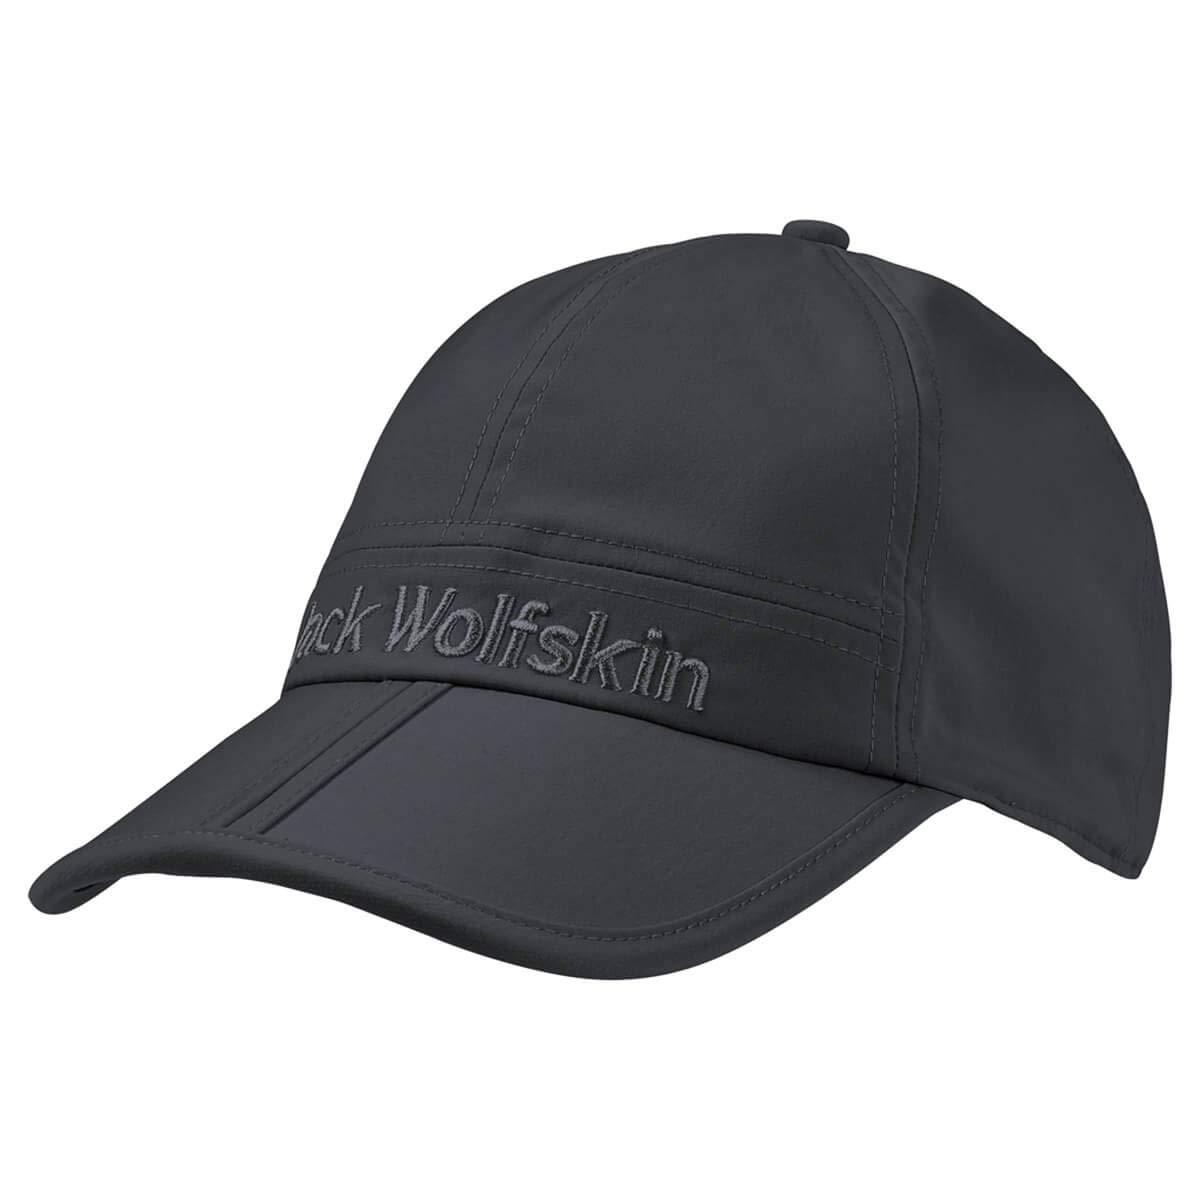 Jack Wolfskin HUNTINGTON CAP